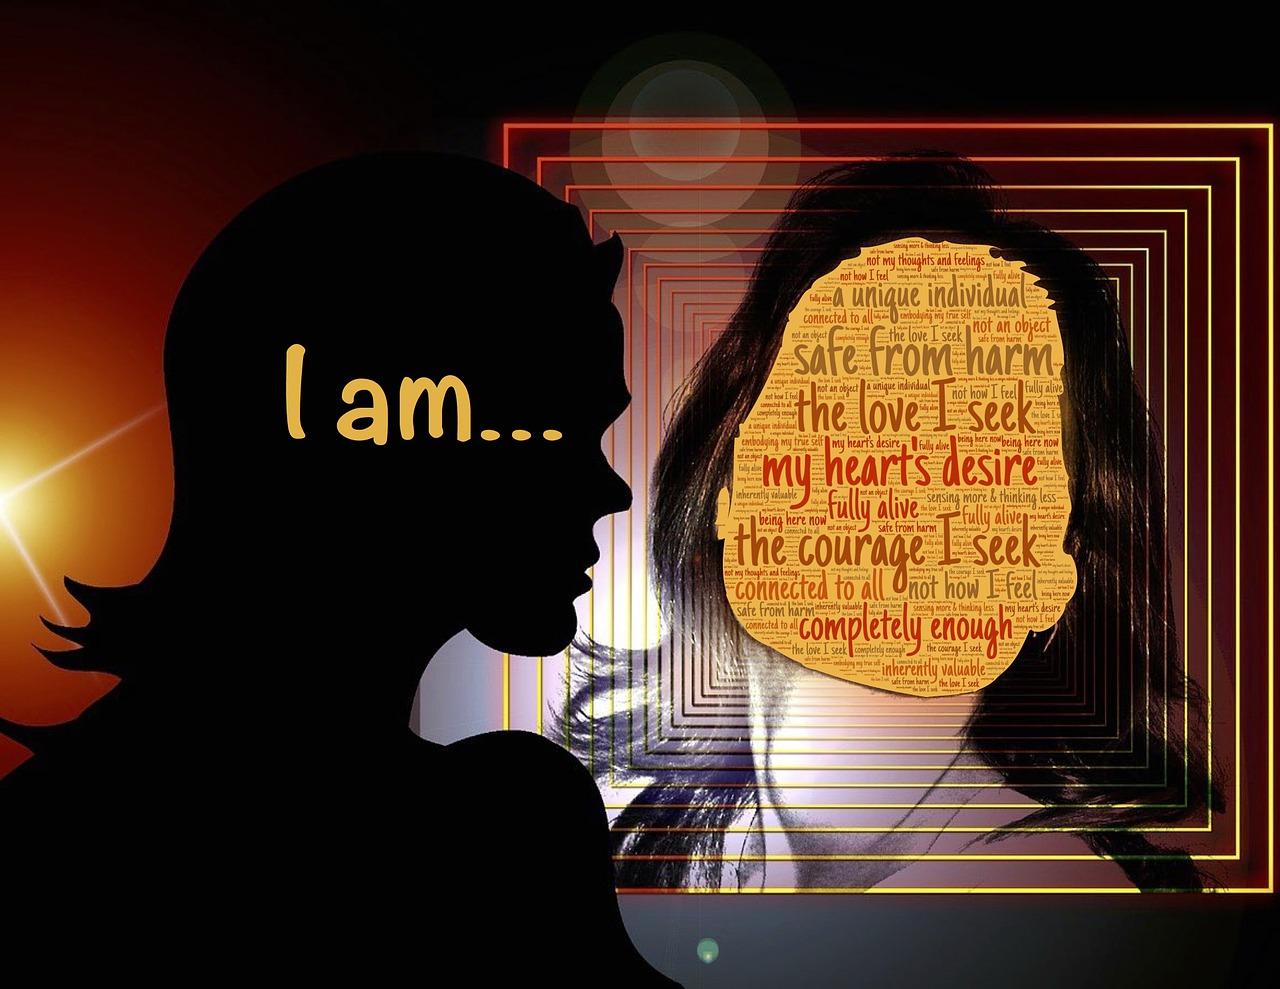 identity-795864_1280.jpg